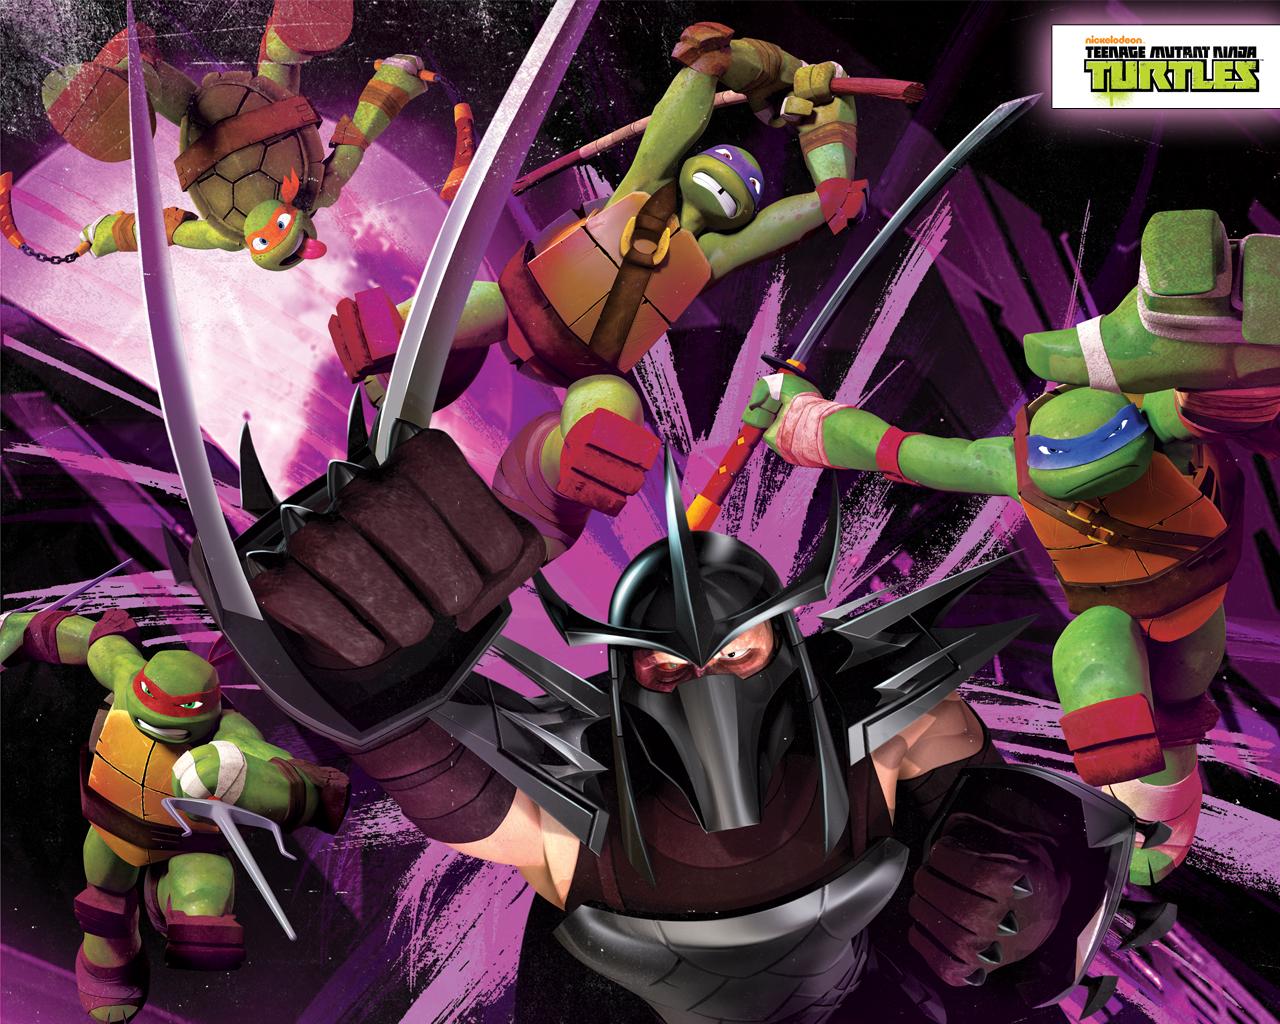 Teenage Mutant Ninja Turtles Vs Shredder Wallpapers Wallpaper Cave